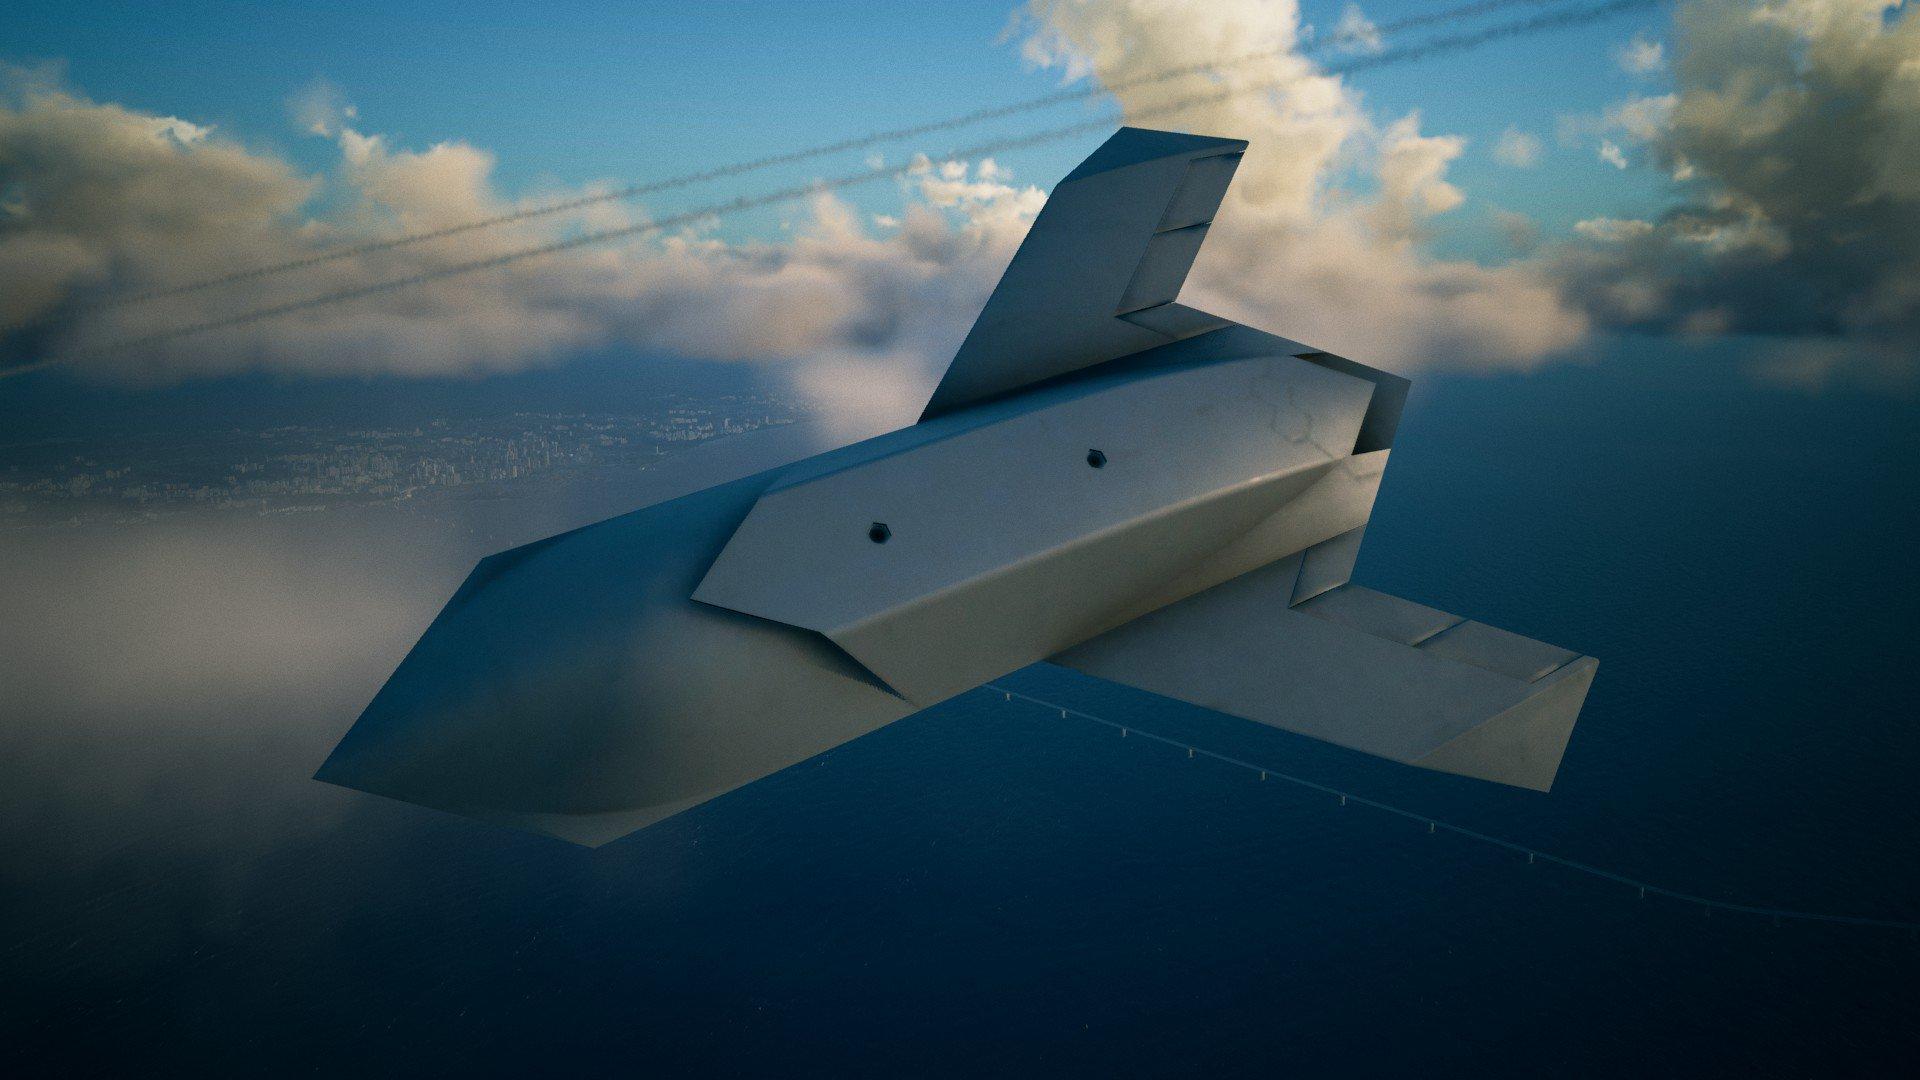 Weapon UAV